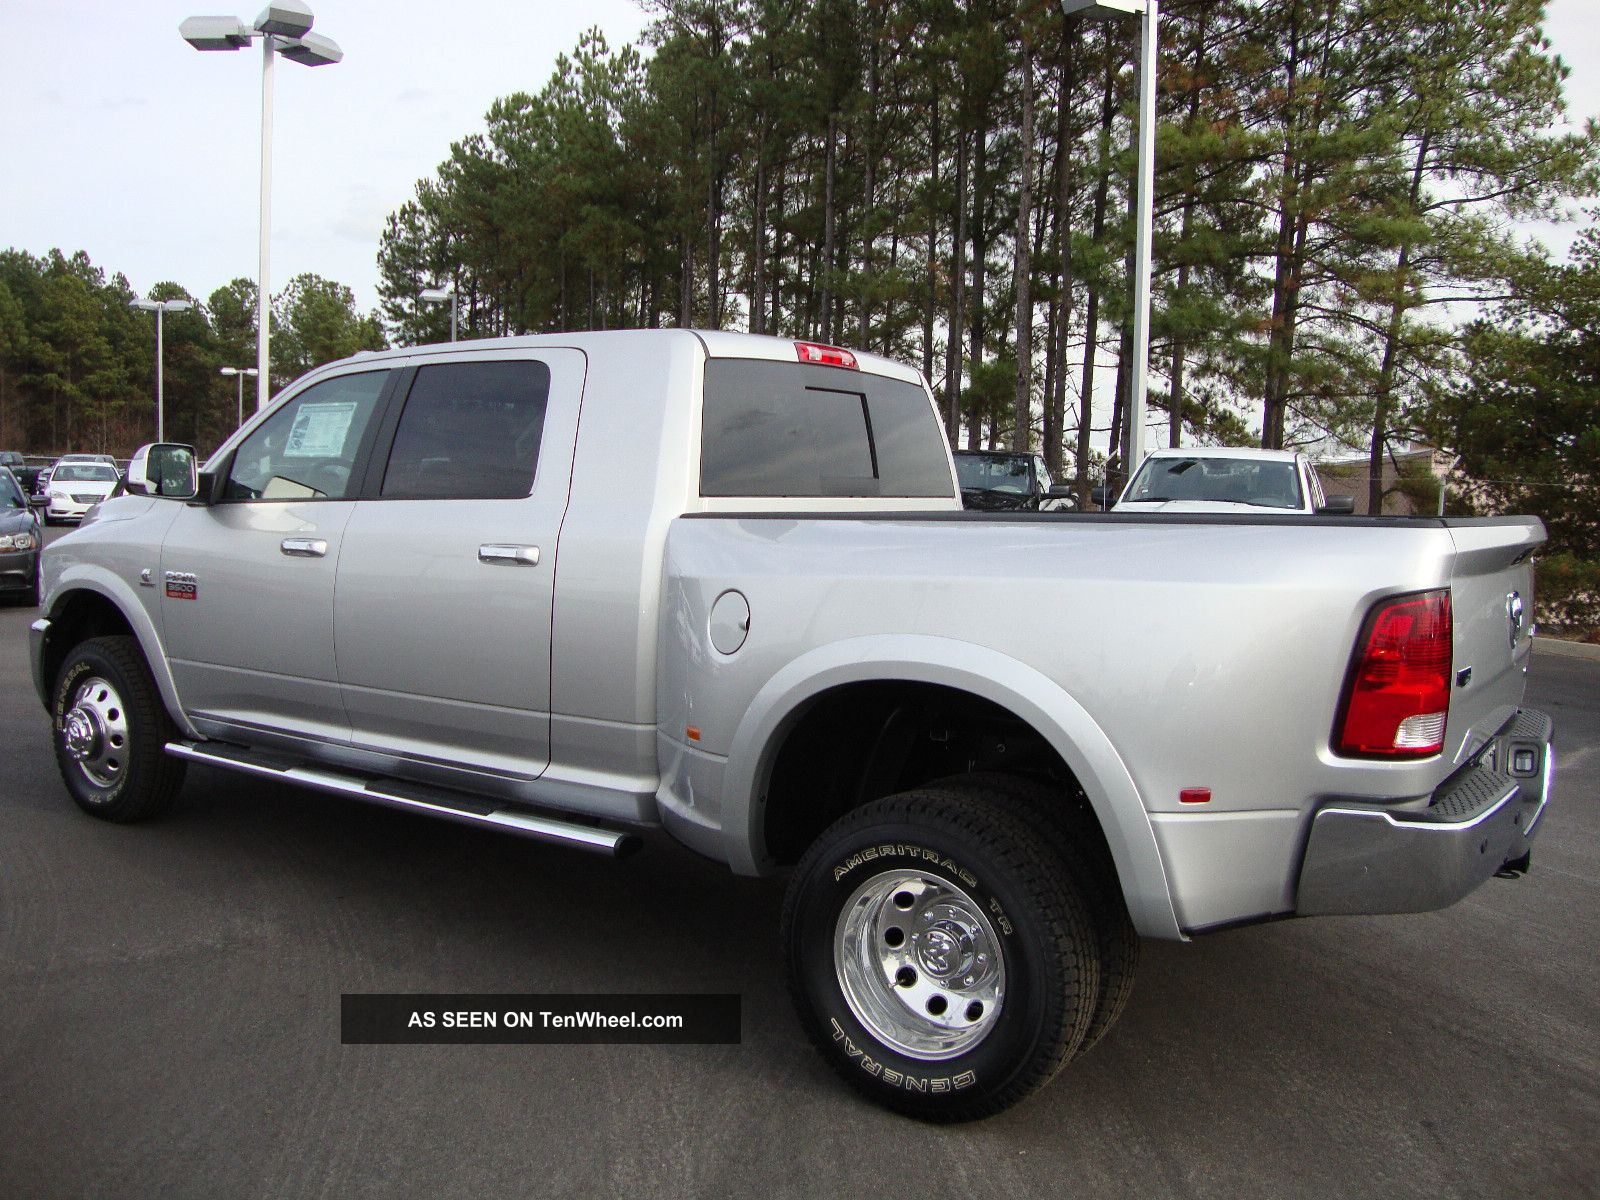 2012 Dodge Ram 3500 Mega Cab Laramie 800 Ho 4x4 Lowest In Usa Us B4 You Buy